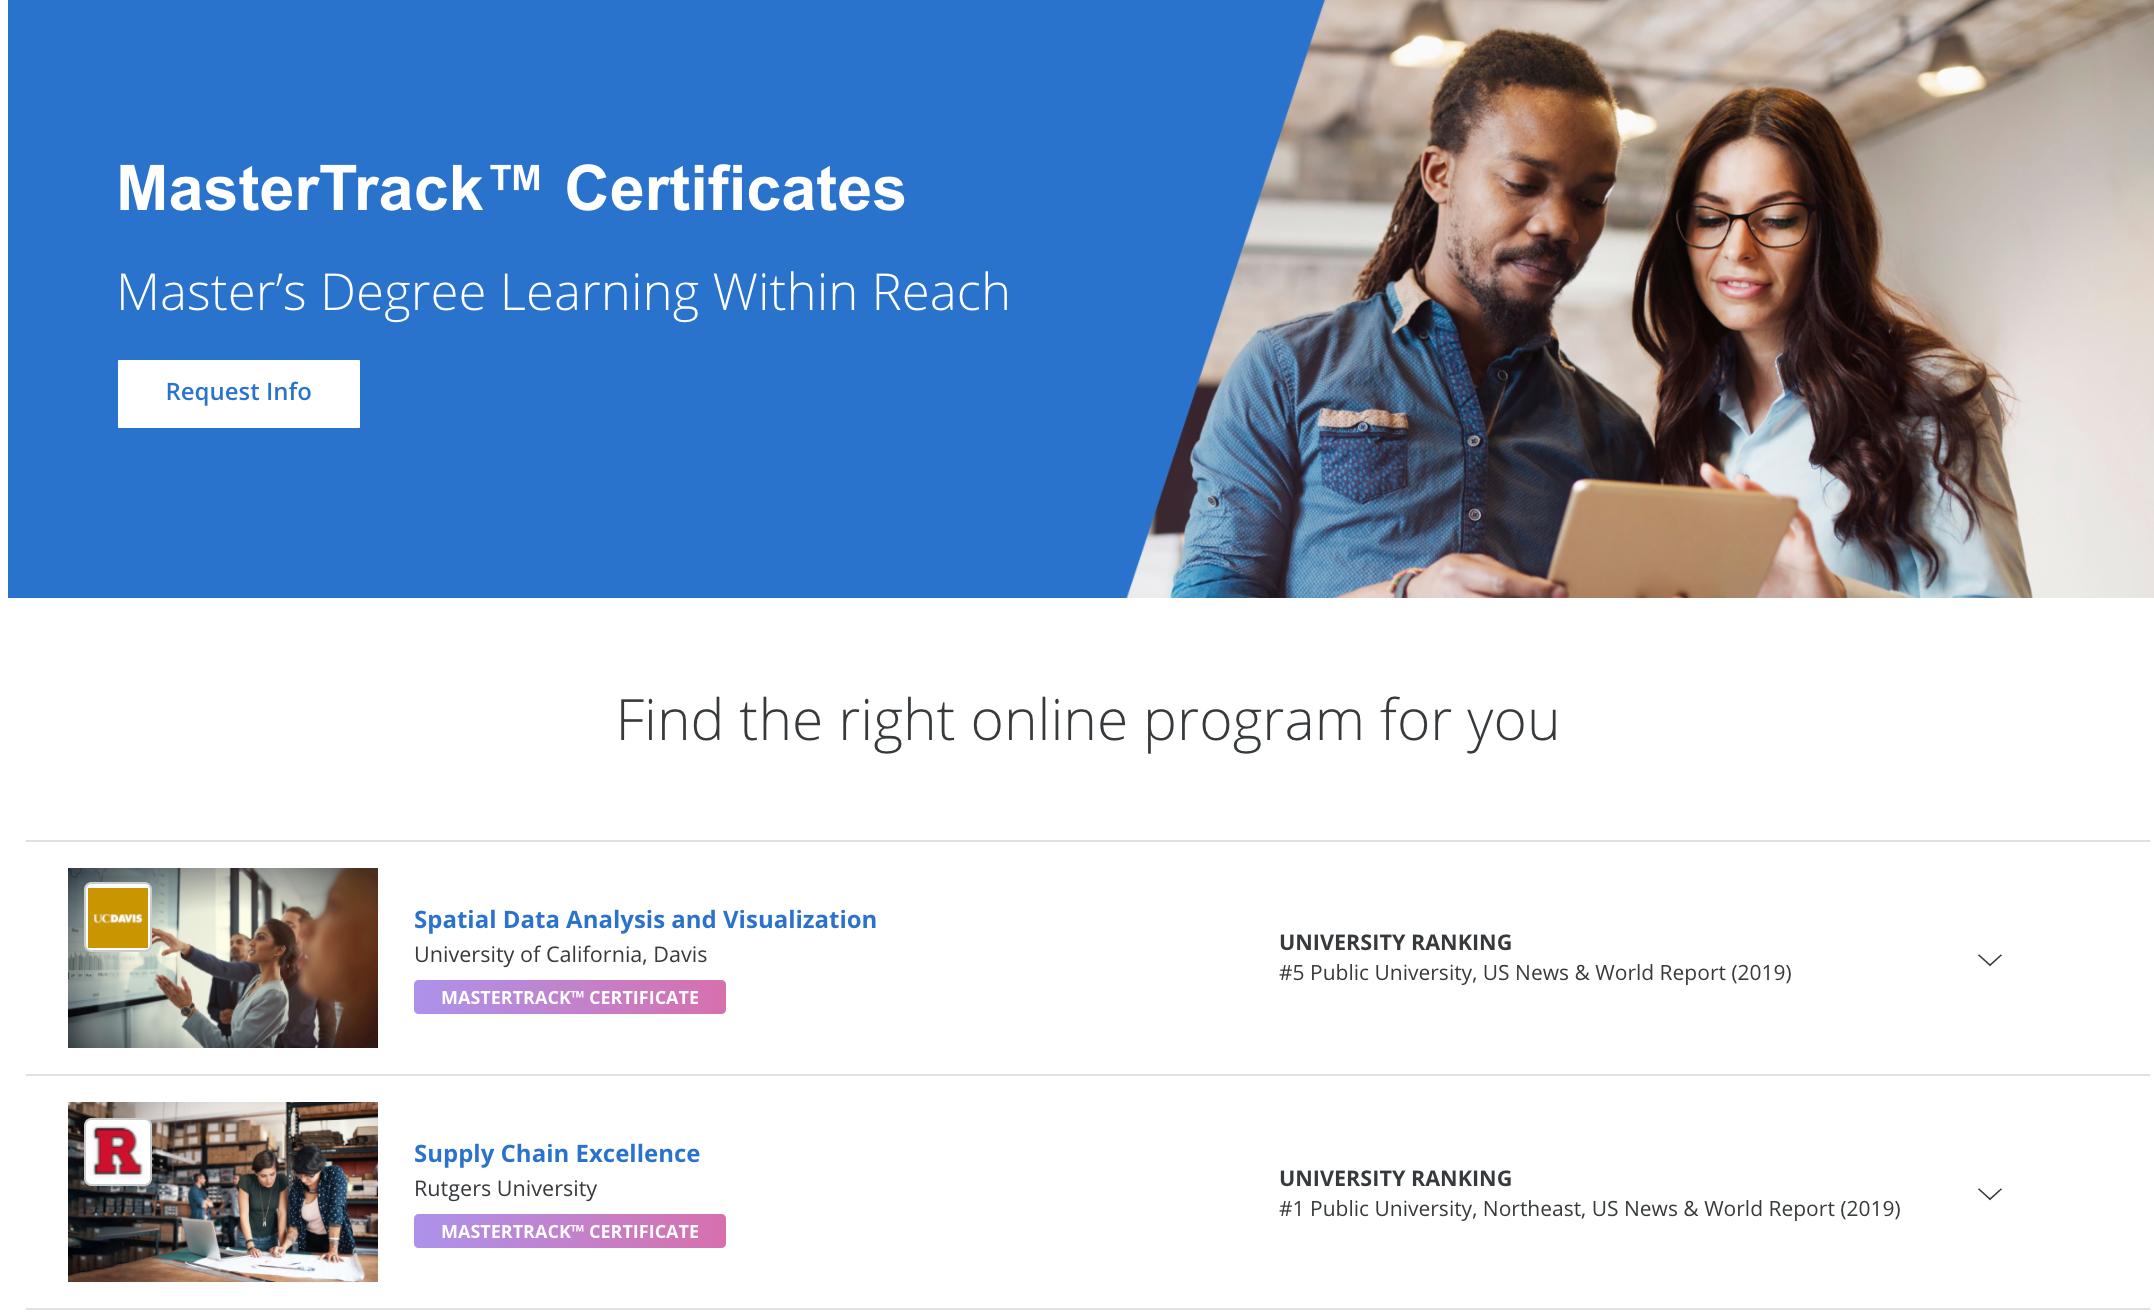 Coursera - MasterTrack™ Certificate